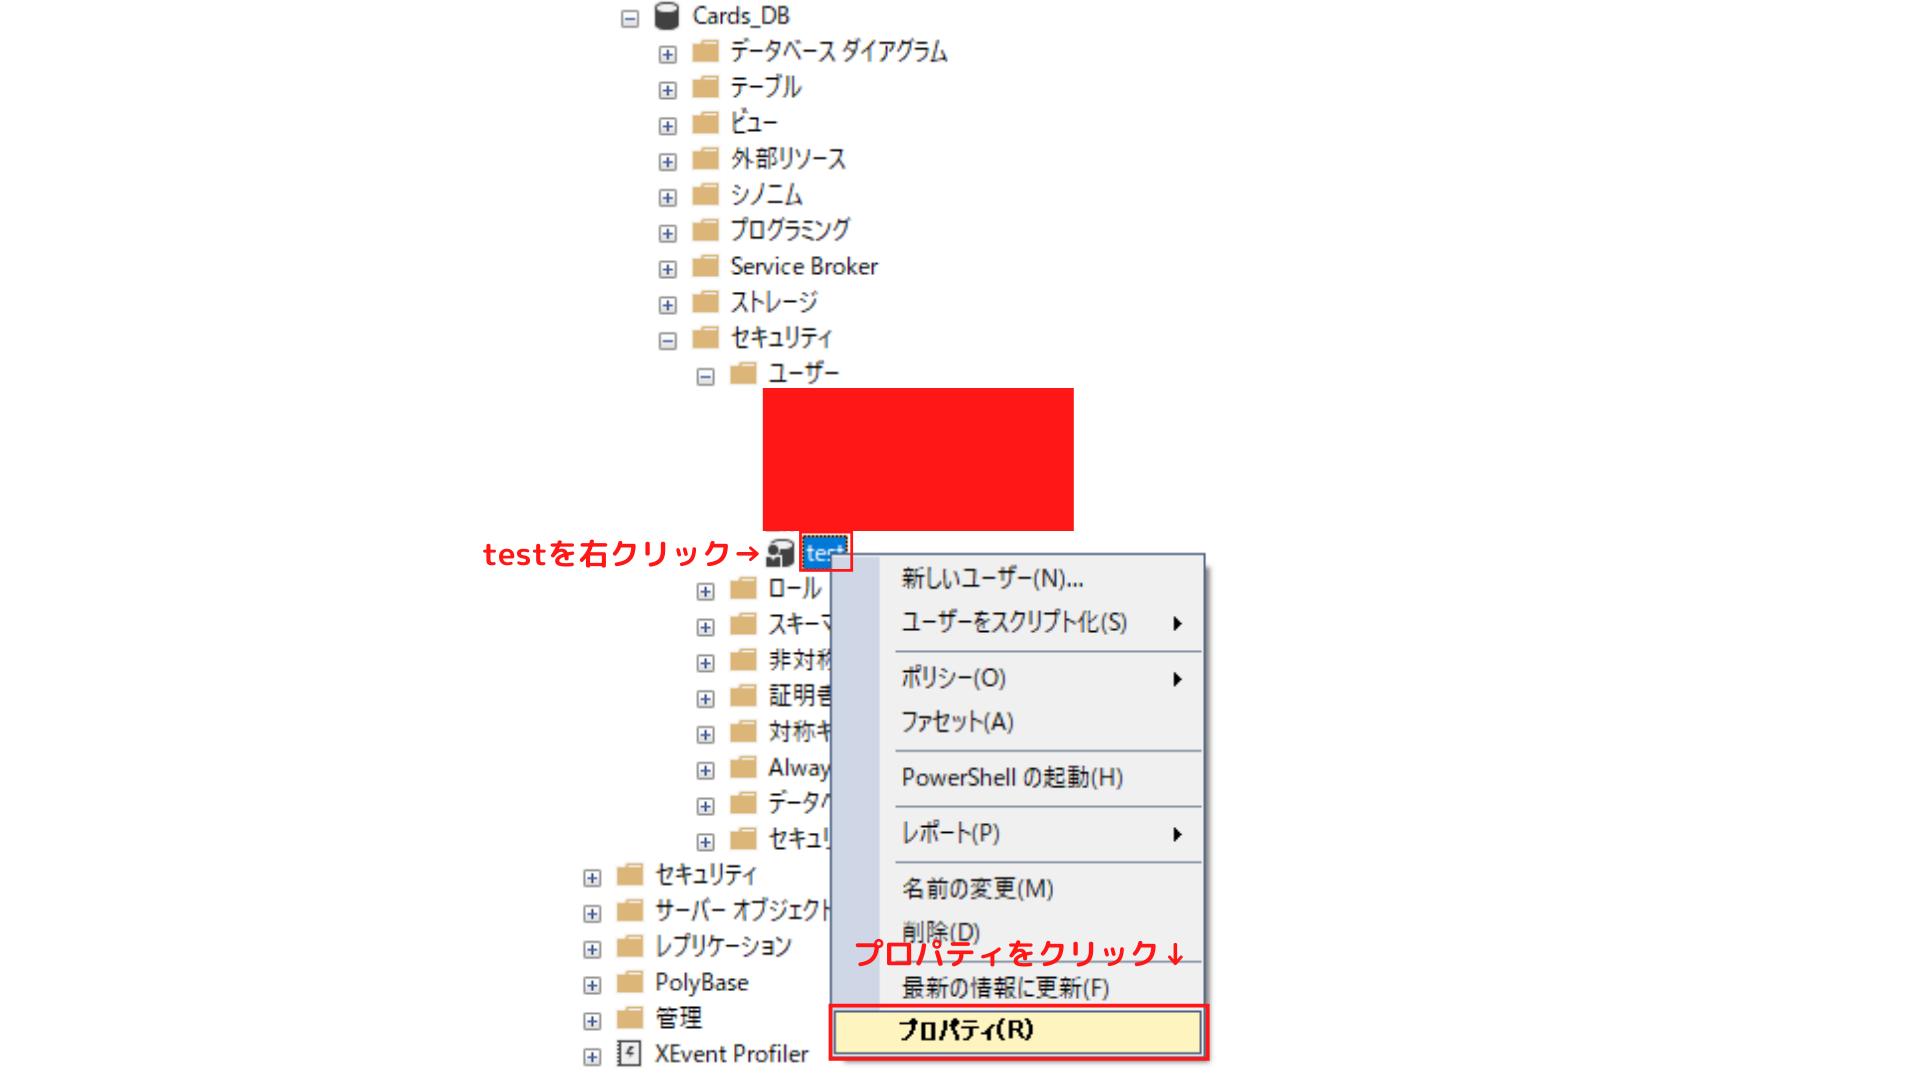 testユーザーのプロパティ設定